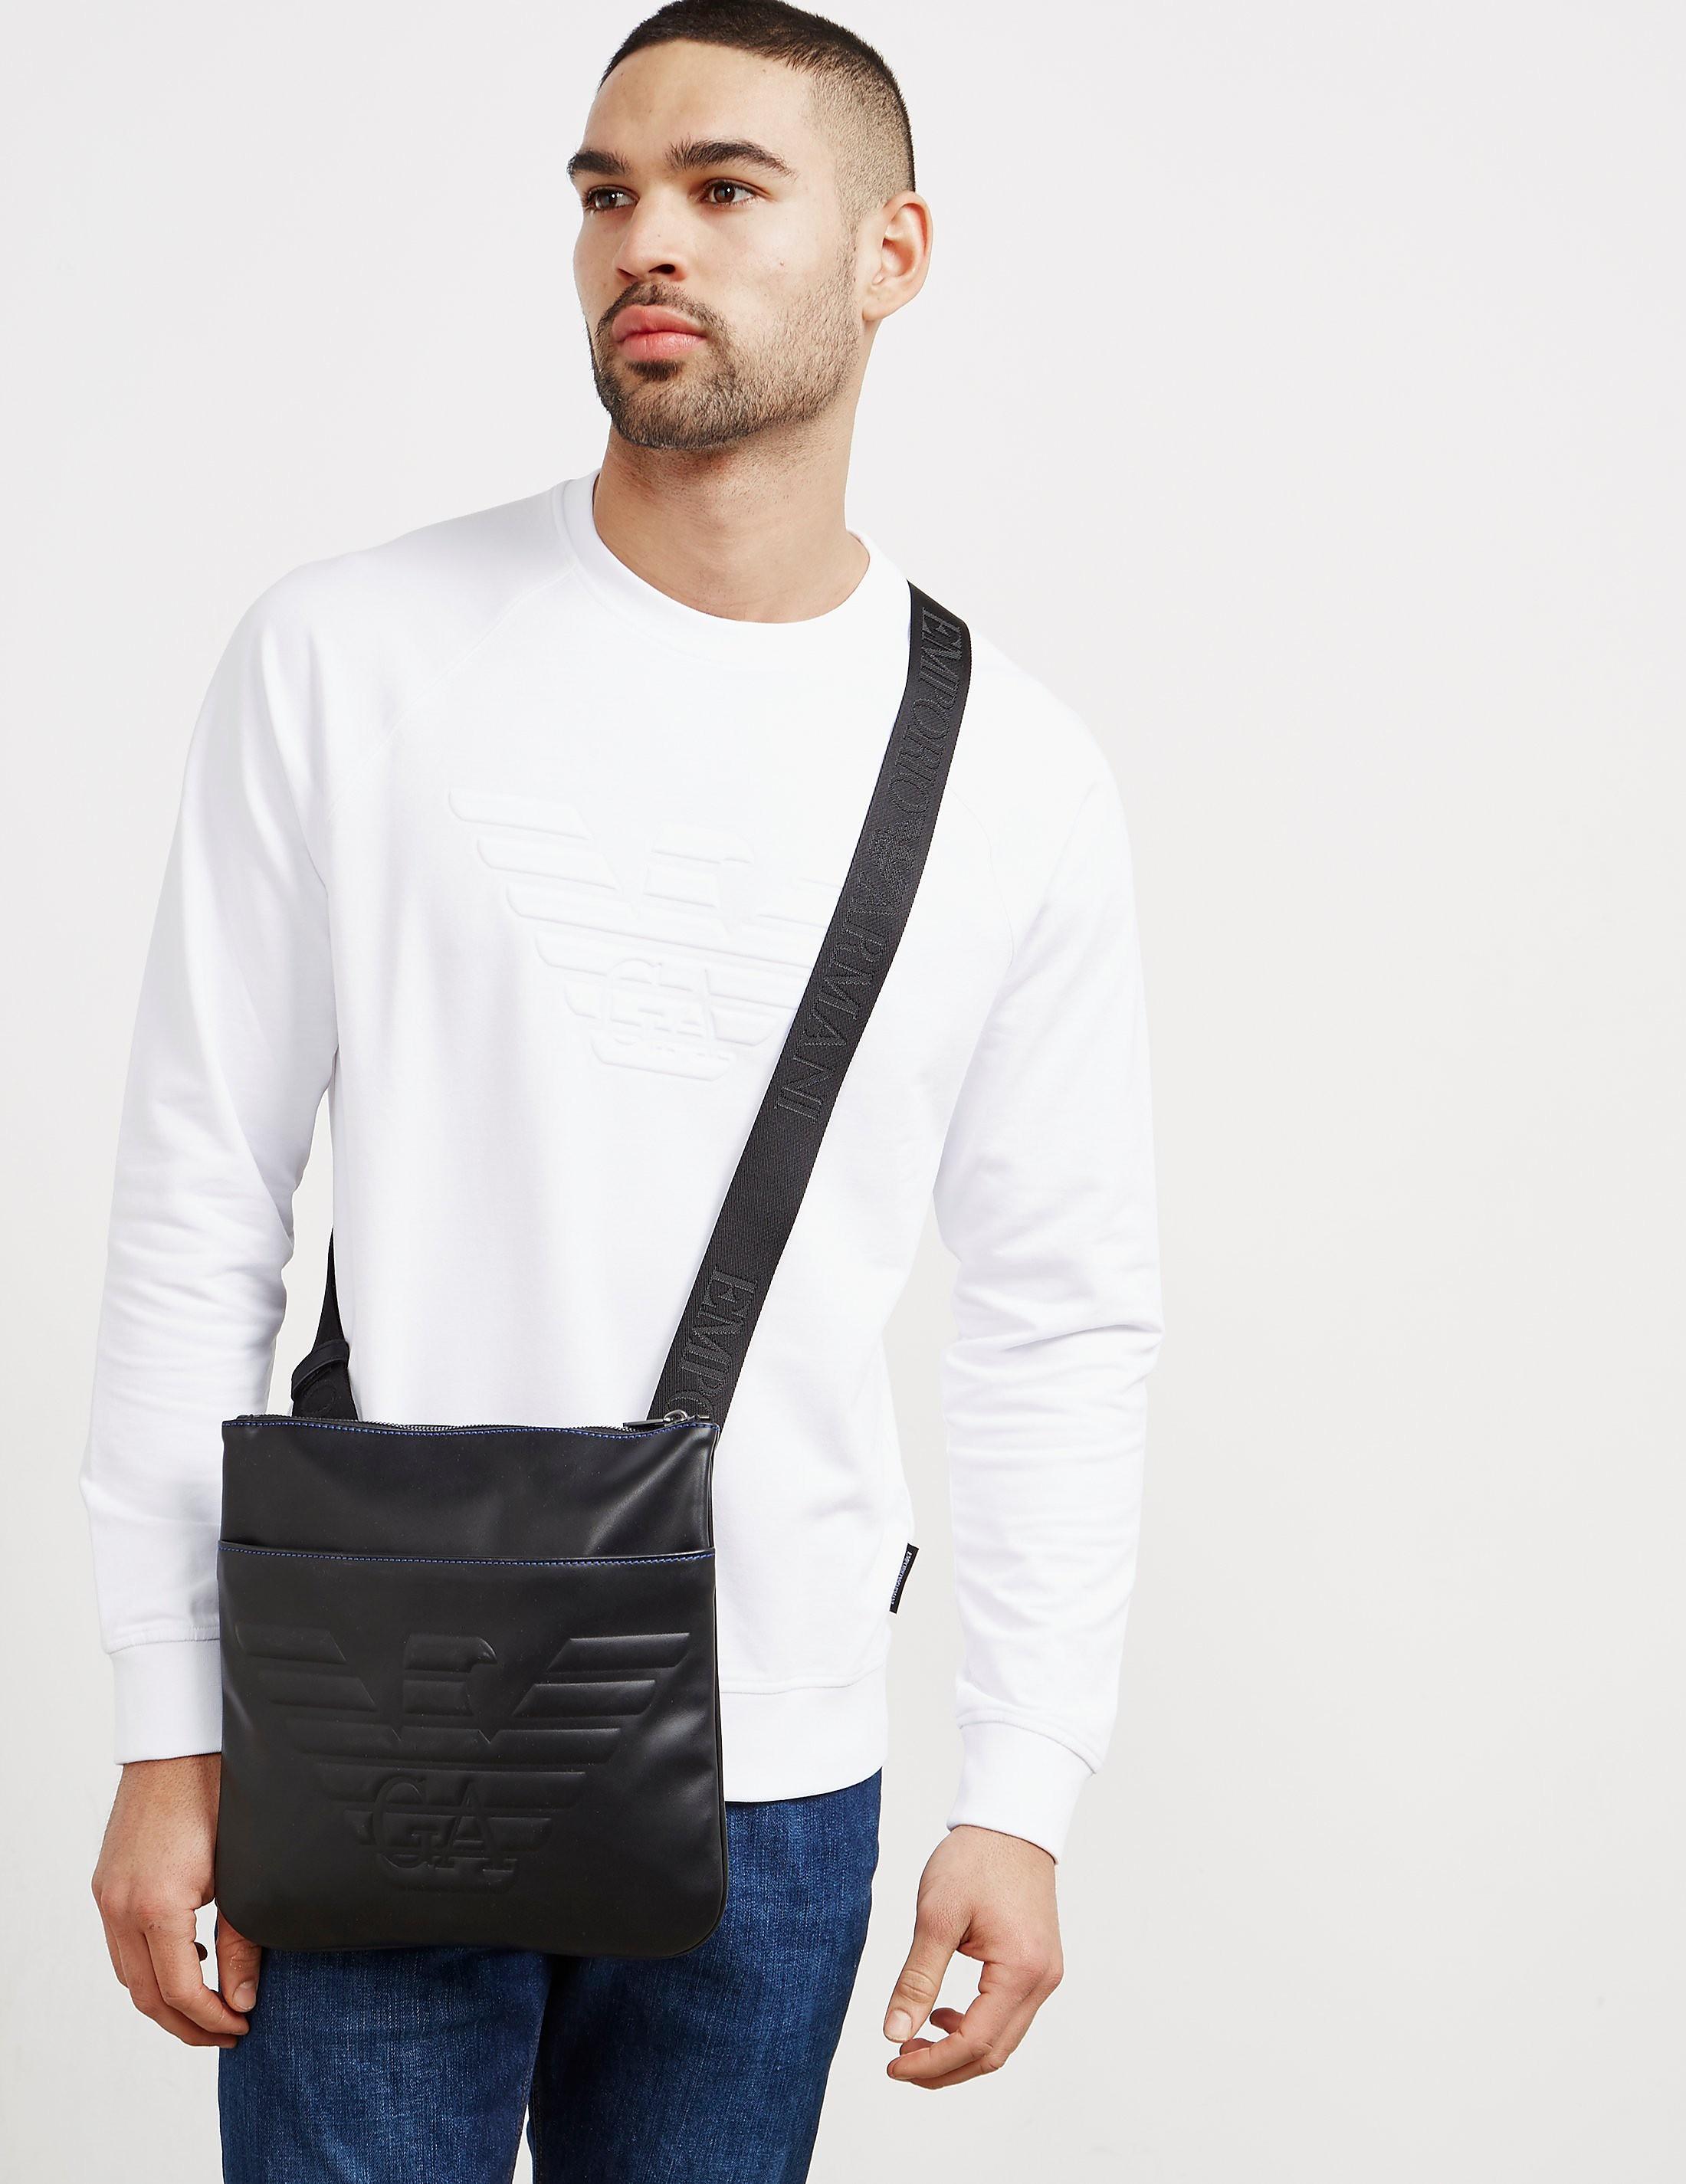 Emporio Armani Eagle Small Item Bag